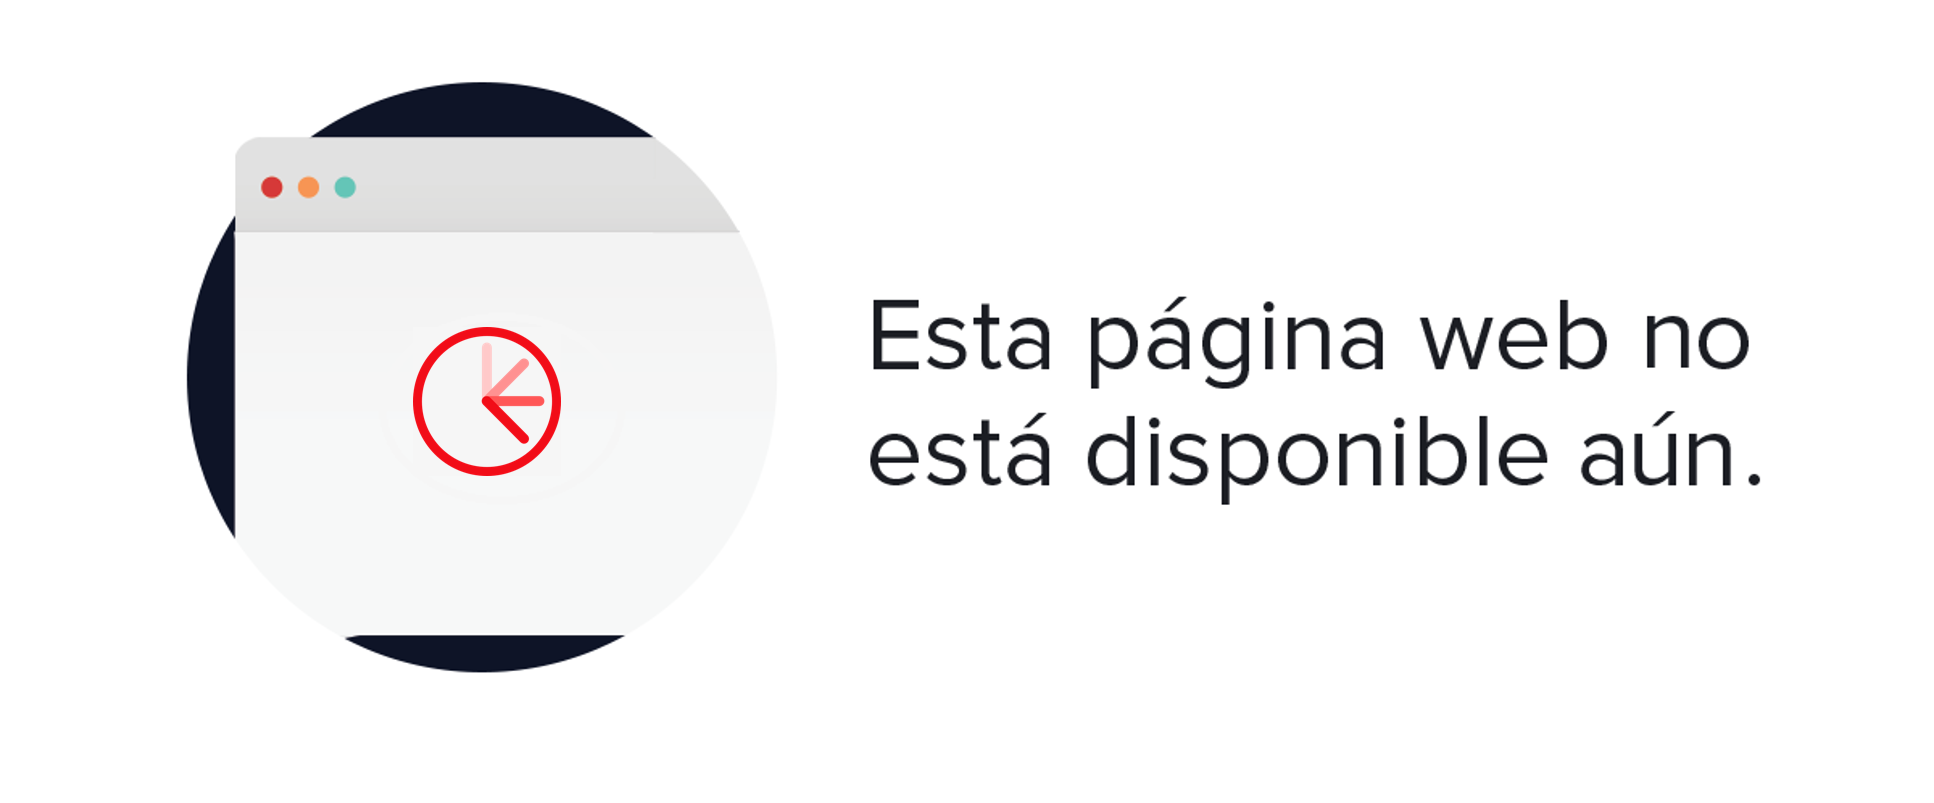 Paul Smith Negro Zapatillas Deportivas Hombre 420130 - Barato - VEQTPLL